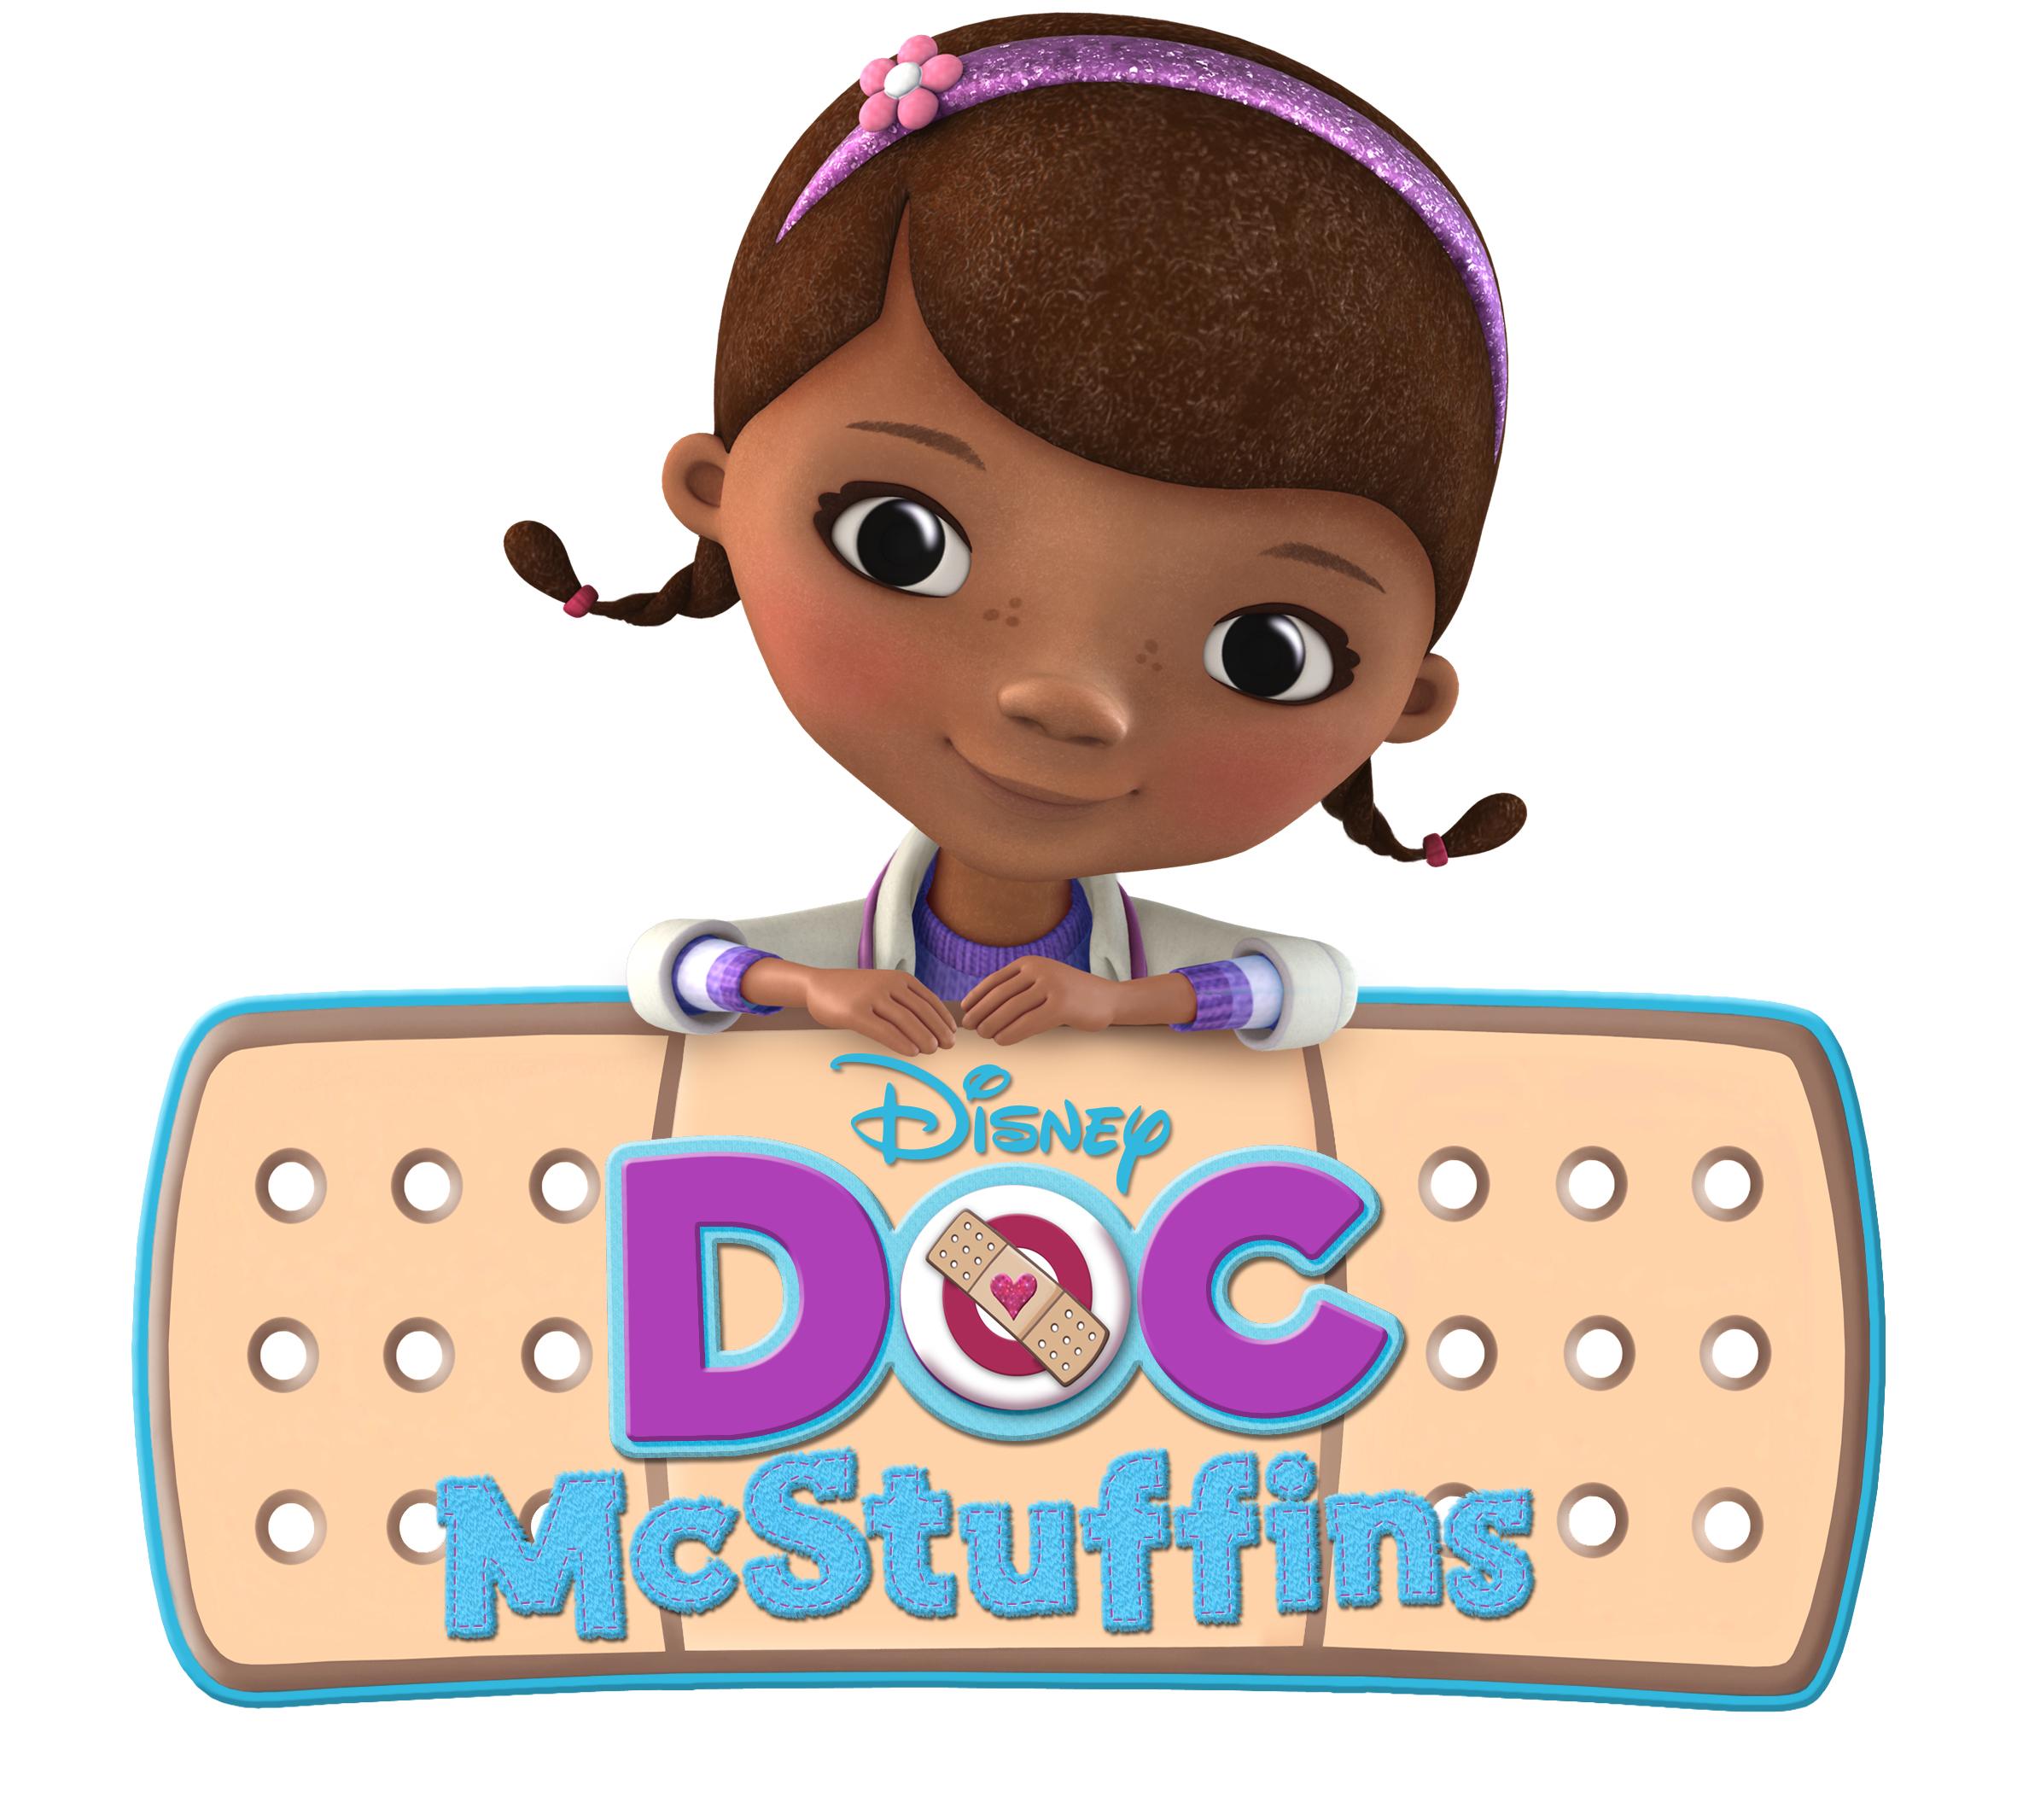 michelle obama gets animated for u0027doc mcstuffins u0027 episode u2013 watch